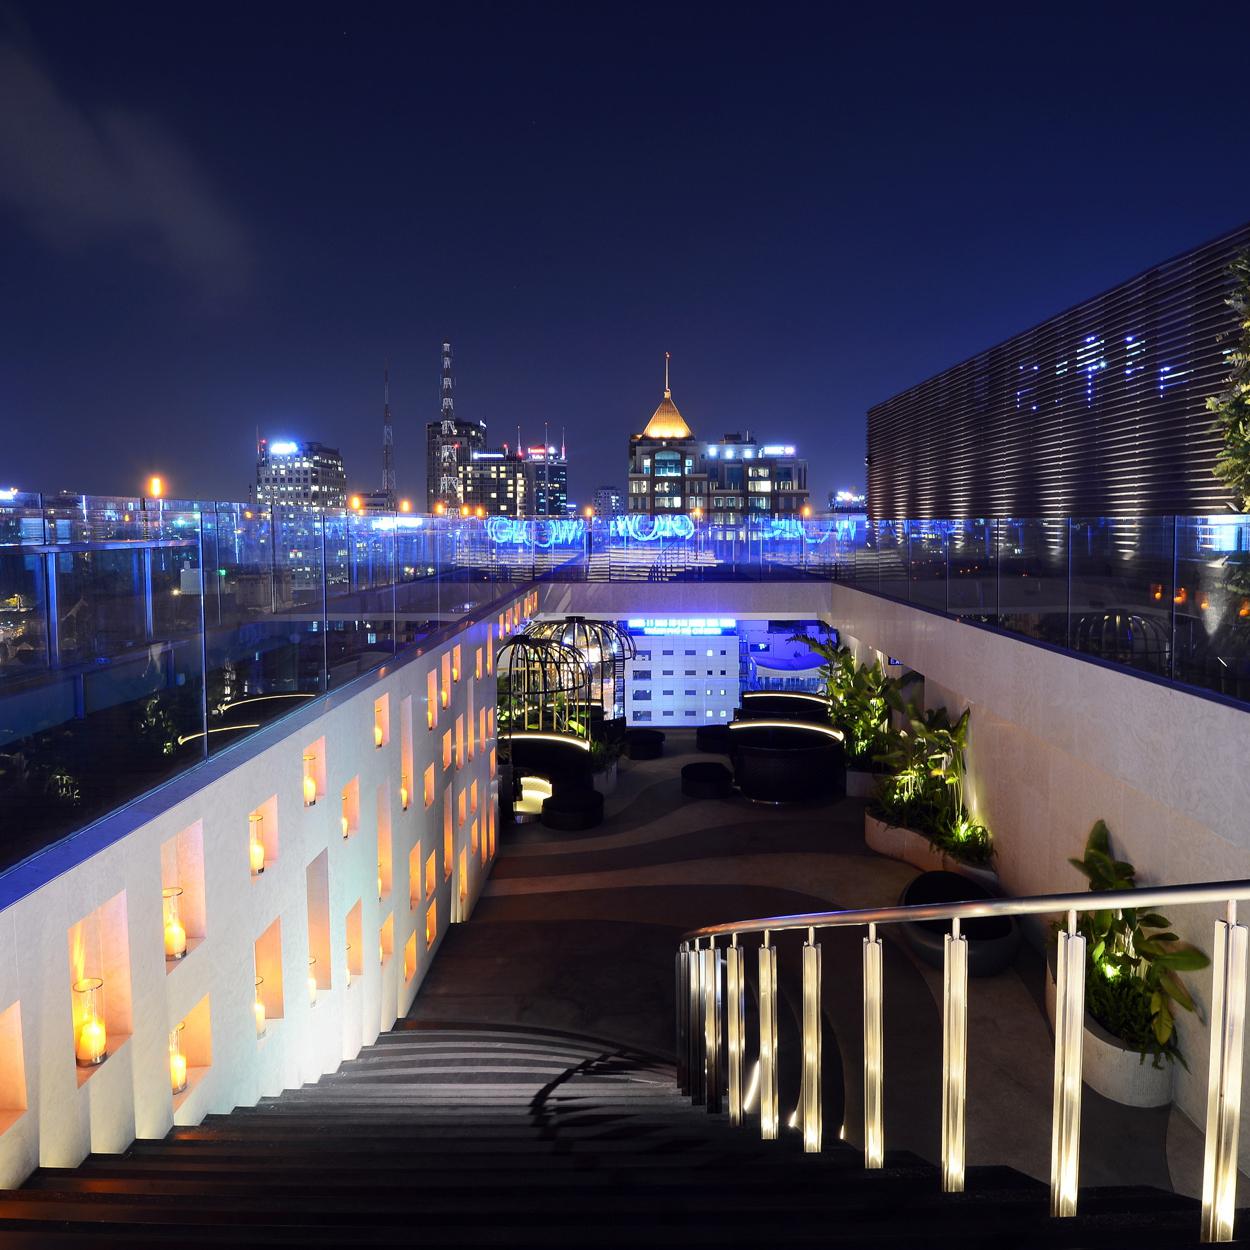 Glow Skybar - with VSI bateig fantasia, Grey wave, Tsing lavastone - simply go Glow !